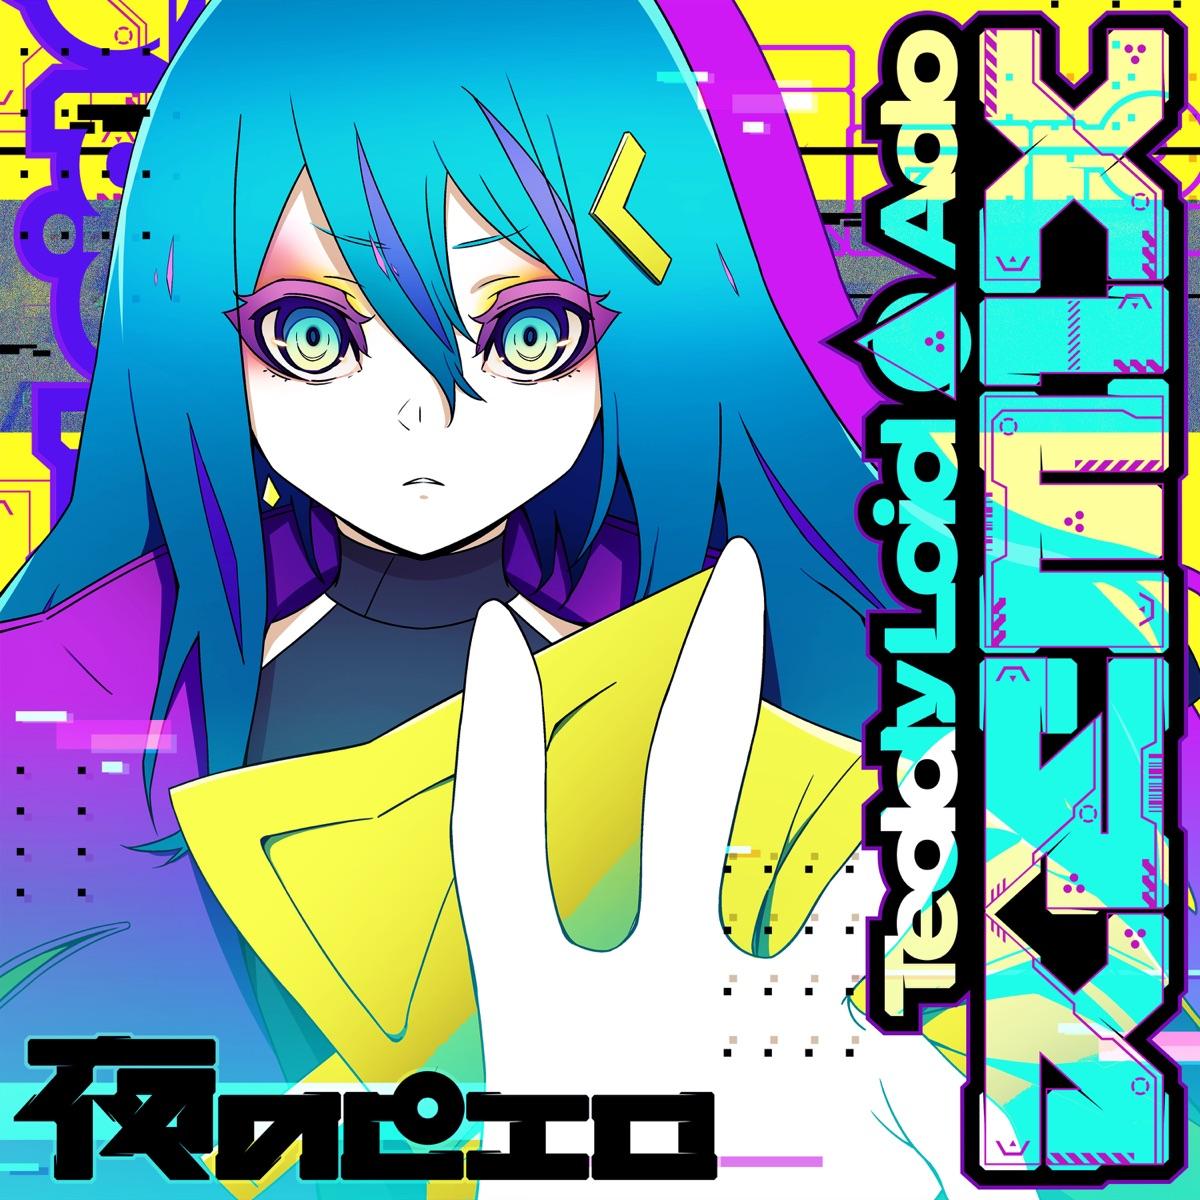 Cover for『Ado - Yoru no Pierrot (TeddyLoid Remix)』from the release『Yoru no Pierrot (TeddyLoid Remix)』